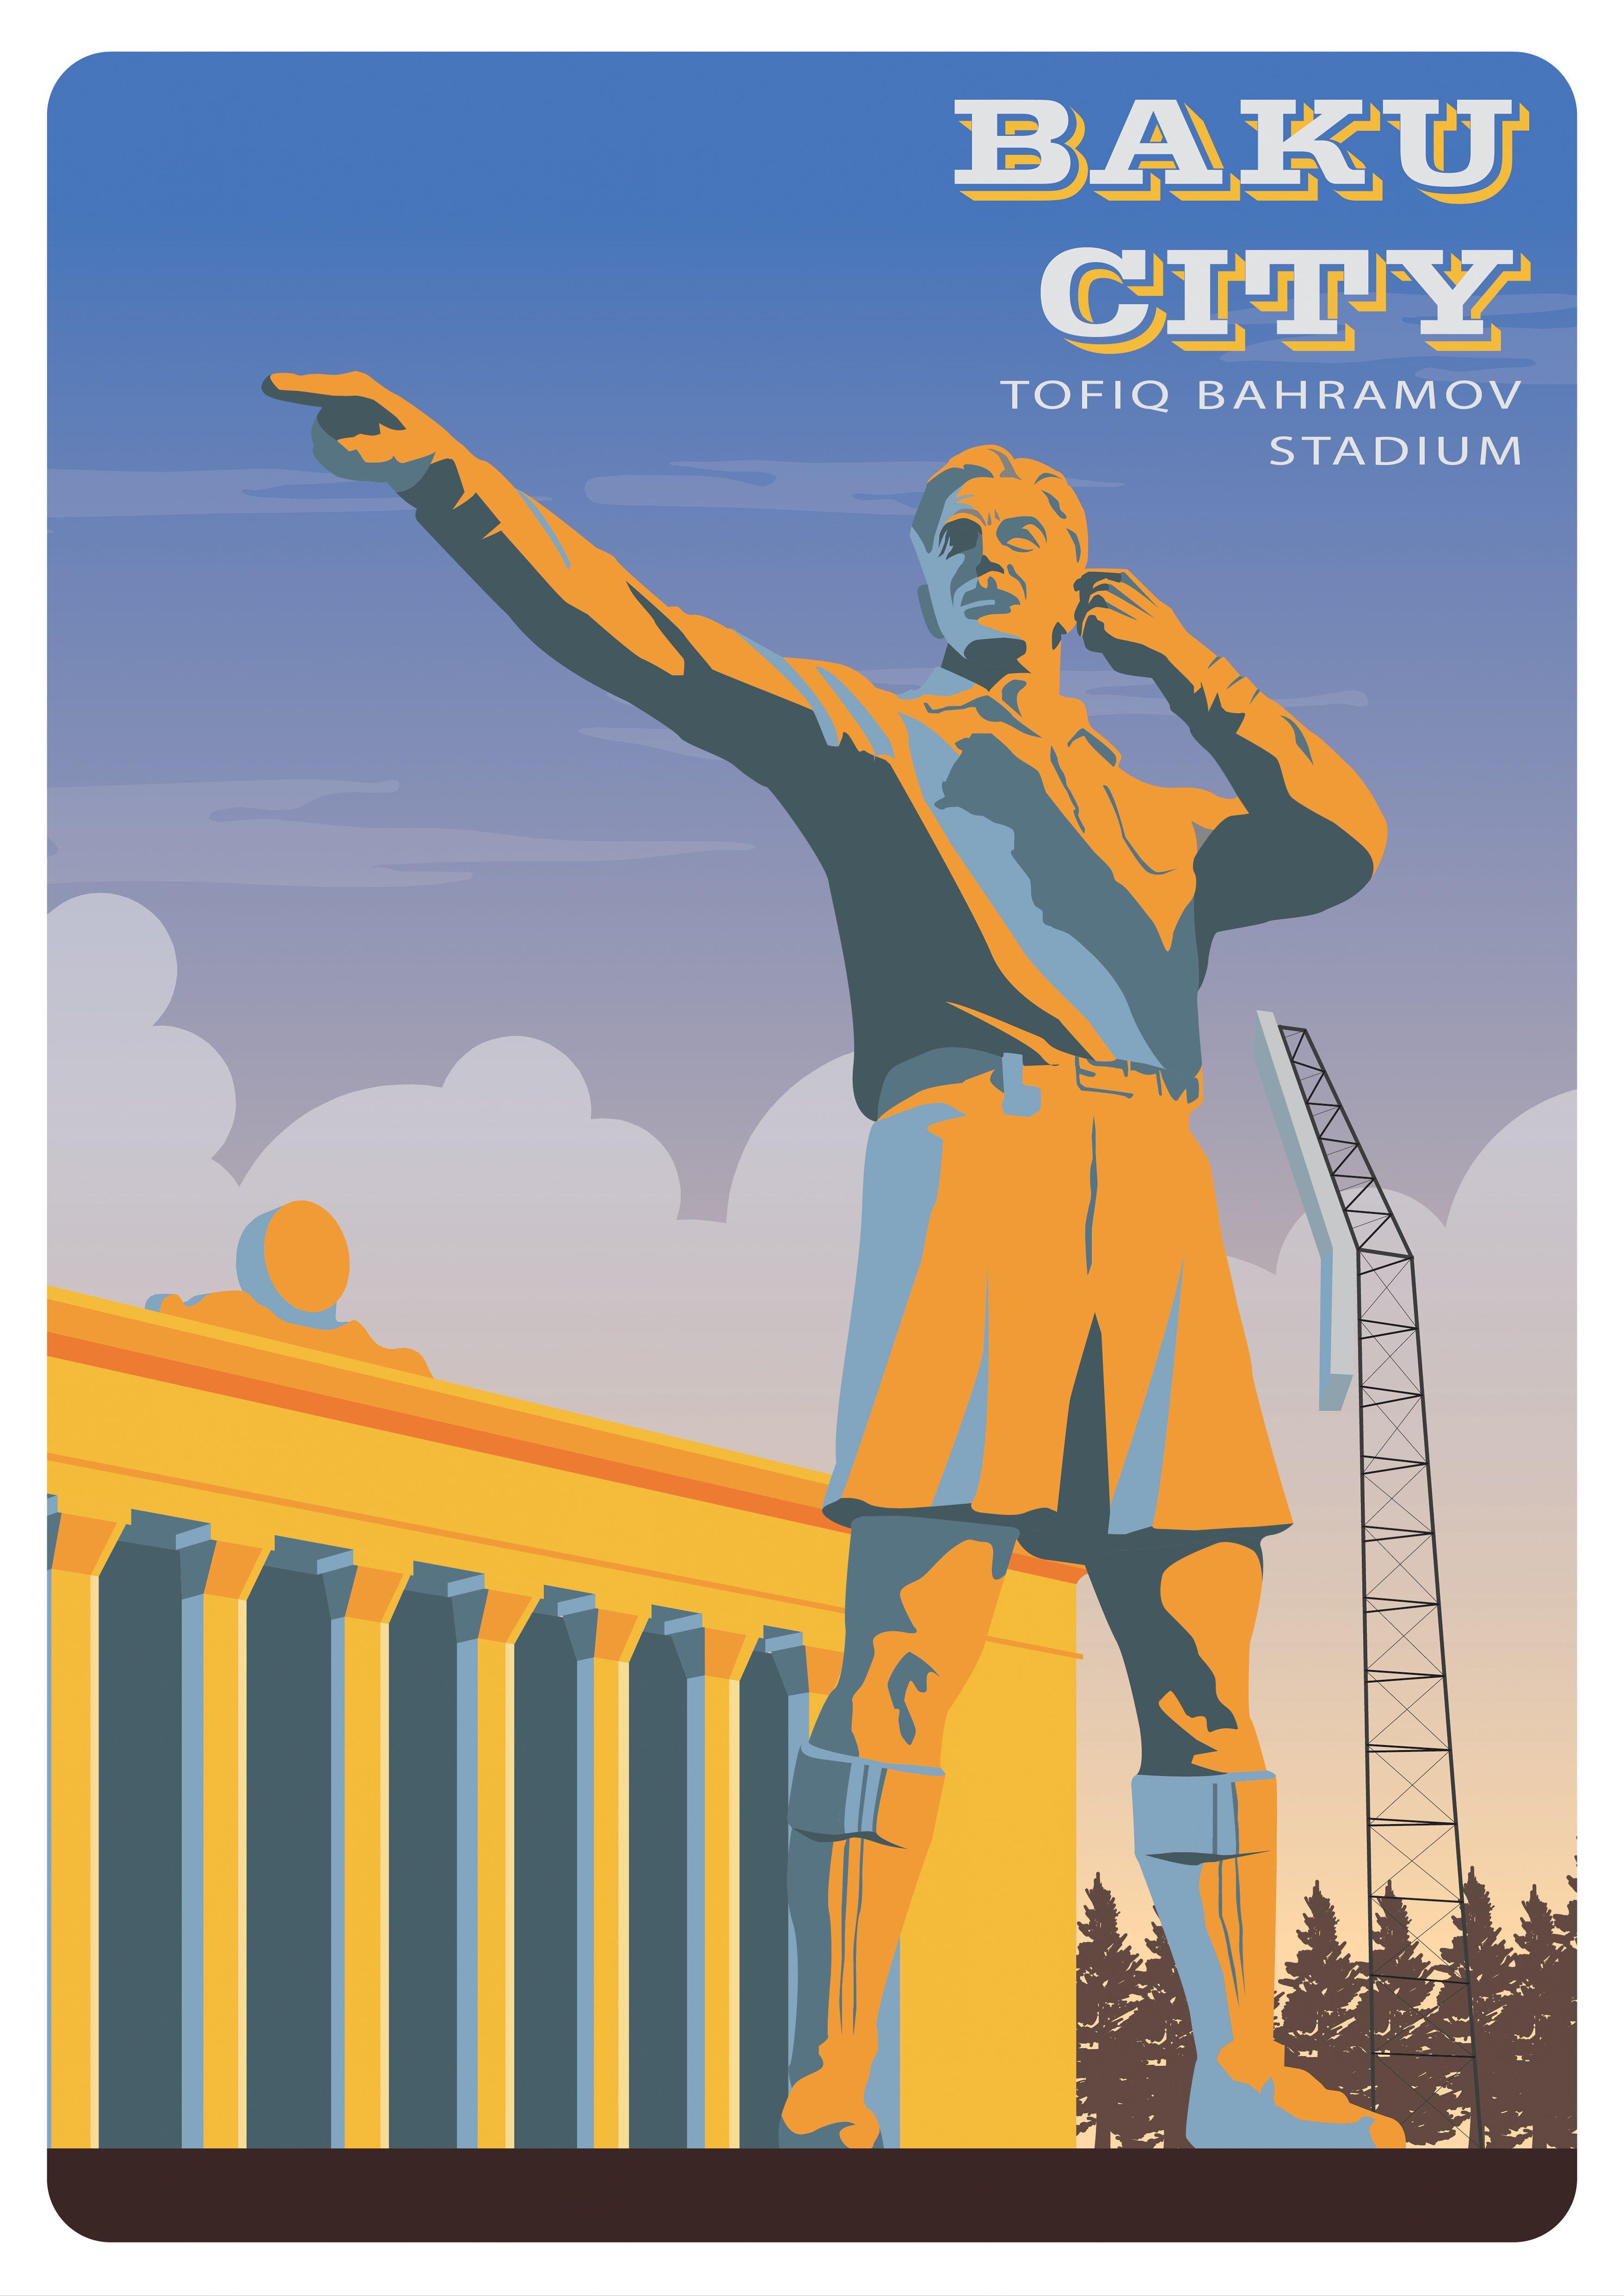 Baku City Retro Poster Tofiq Bahramov Stadium Retro Poster Poster Baku City